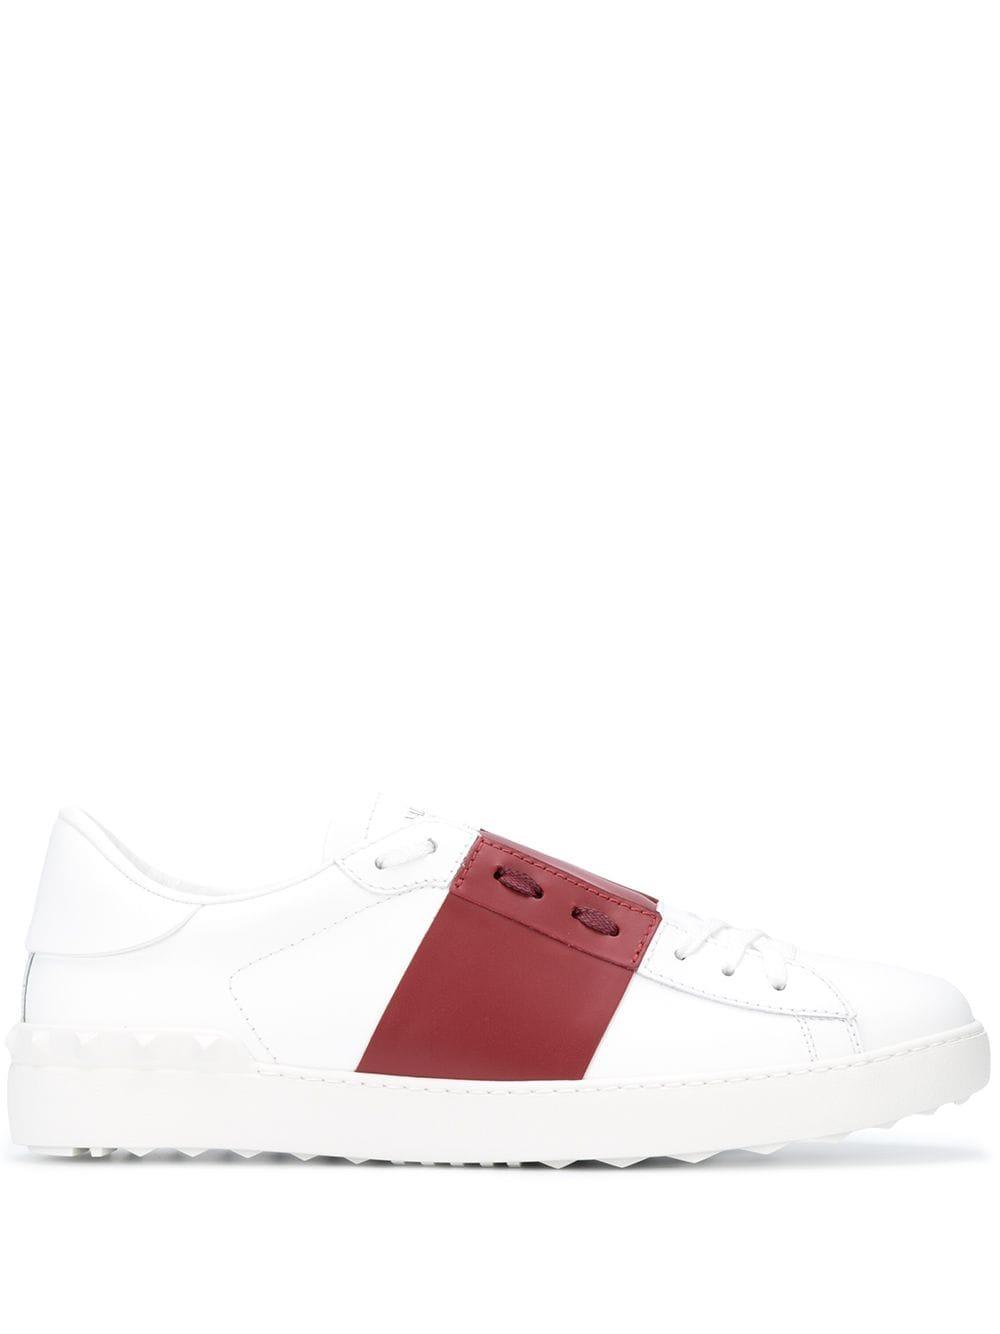 VALENTINO GARAVANI- Open Sneakers- Man- 42½ - White